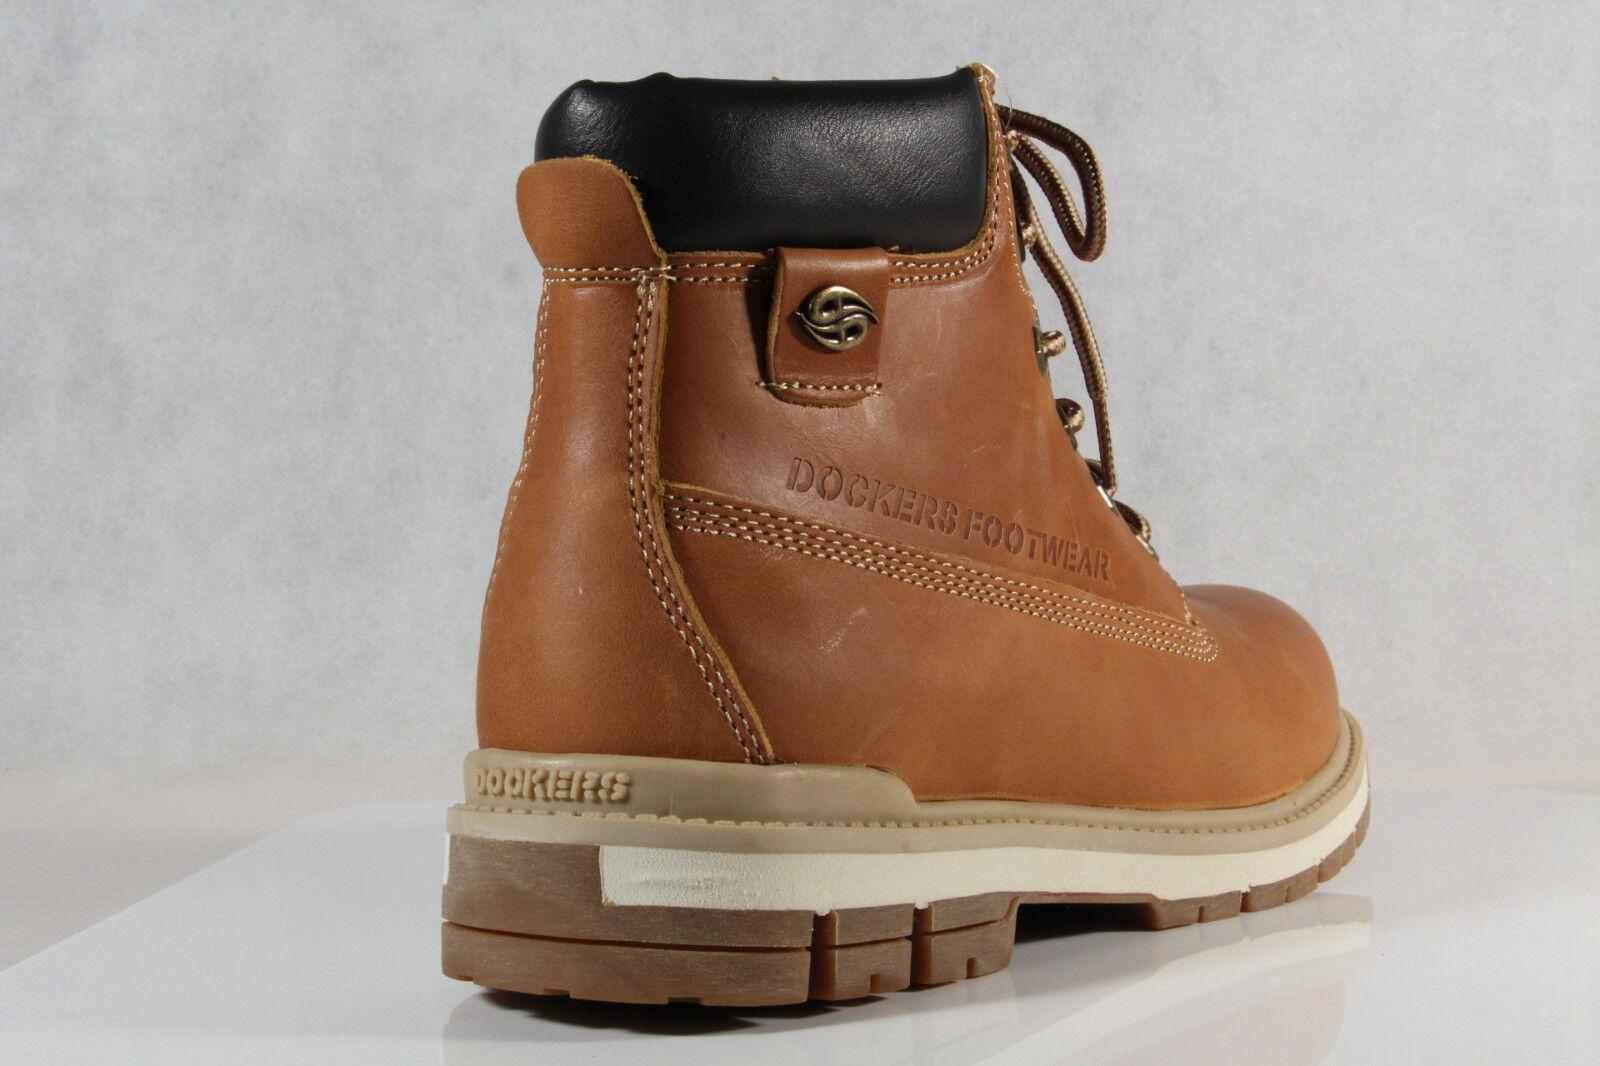 DOCKERS Stiefeletten Boots Winter Leder Schuhe warm braun NEU